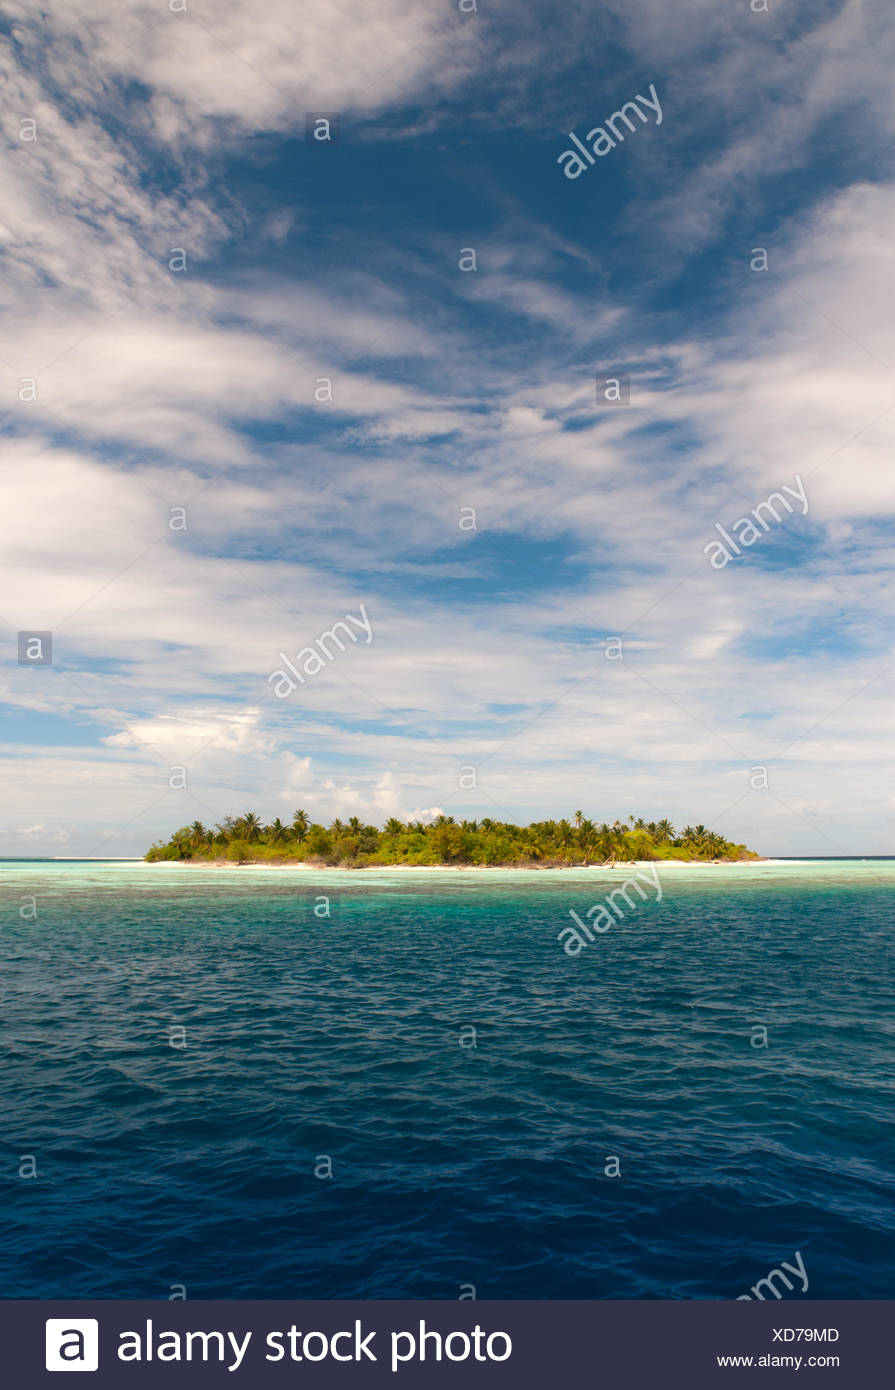 desert island in the indian ocean - Stock Image